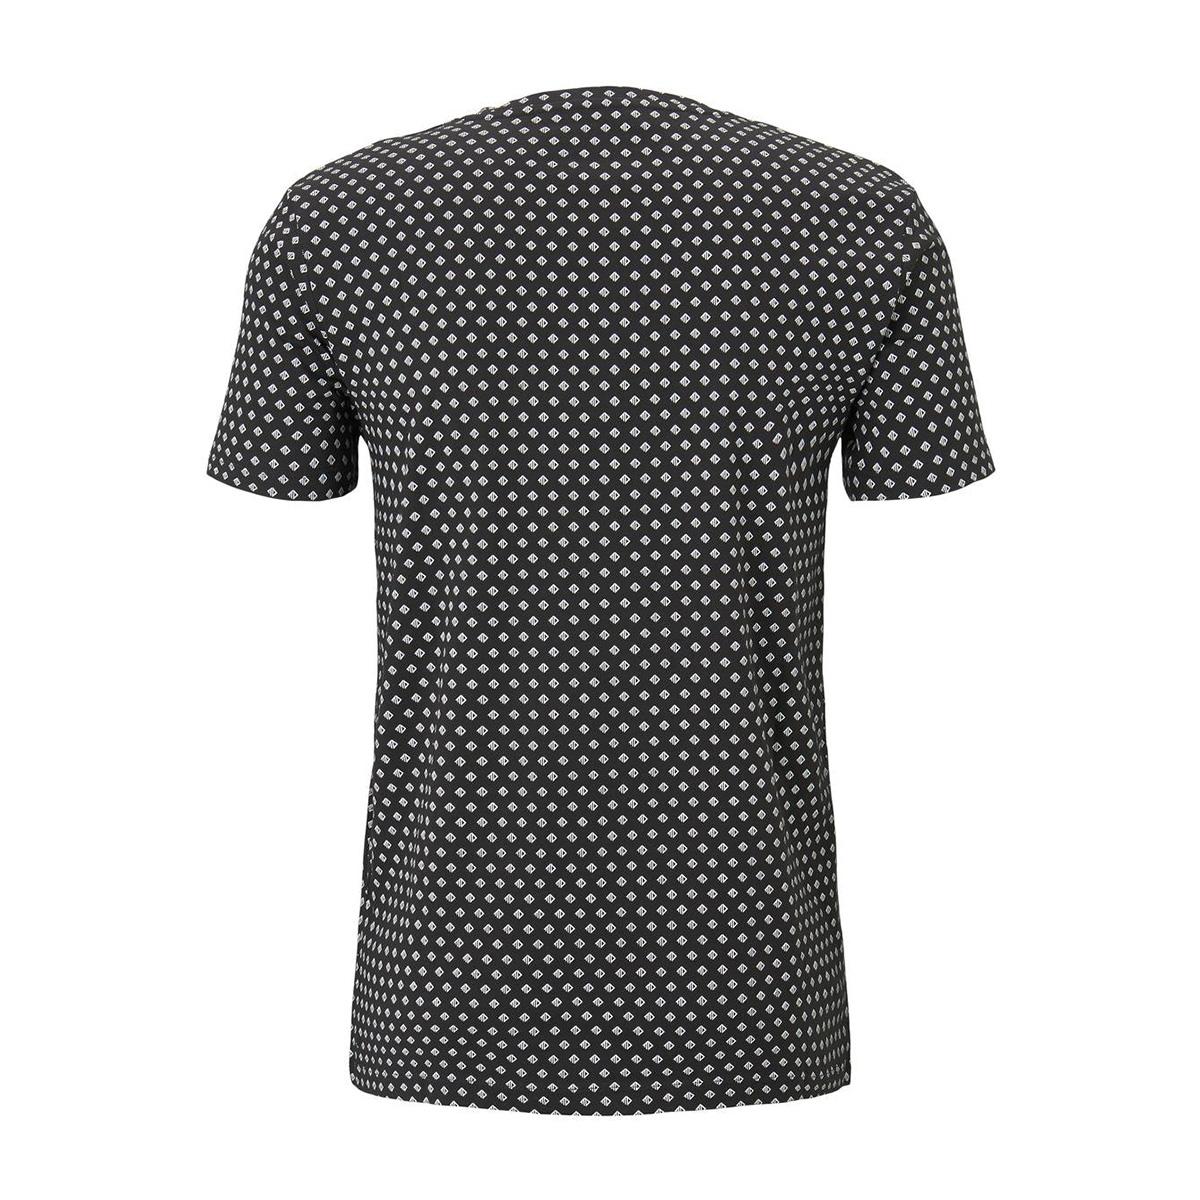 t shirt met borstzak 1015665xx12 tom tailor t-shirt 20889